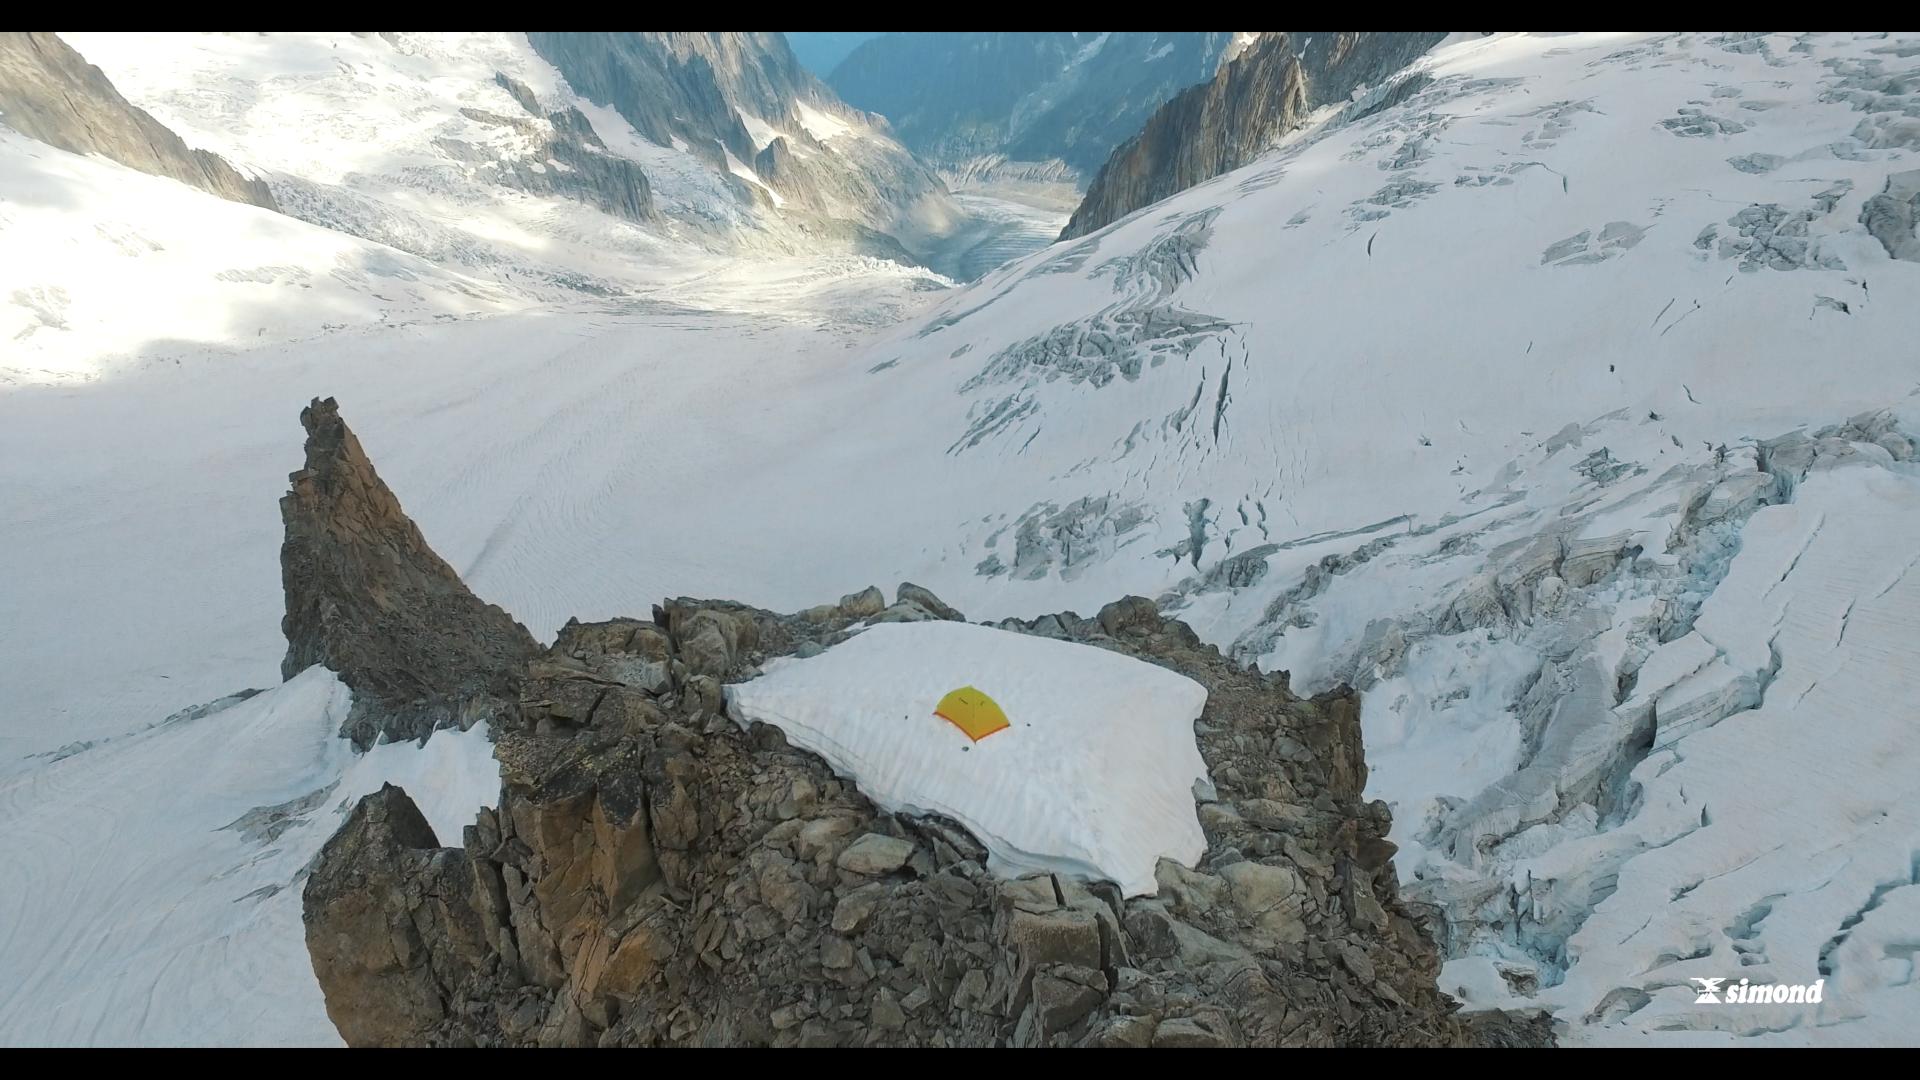 Simond Alpi1